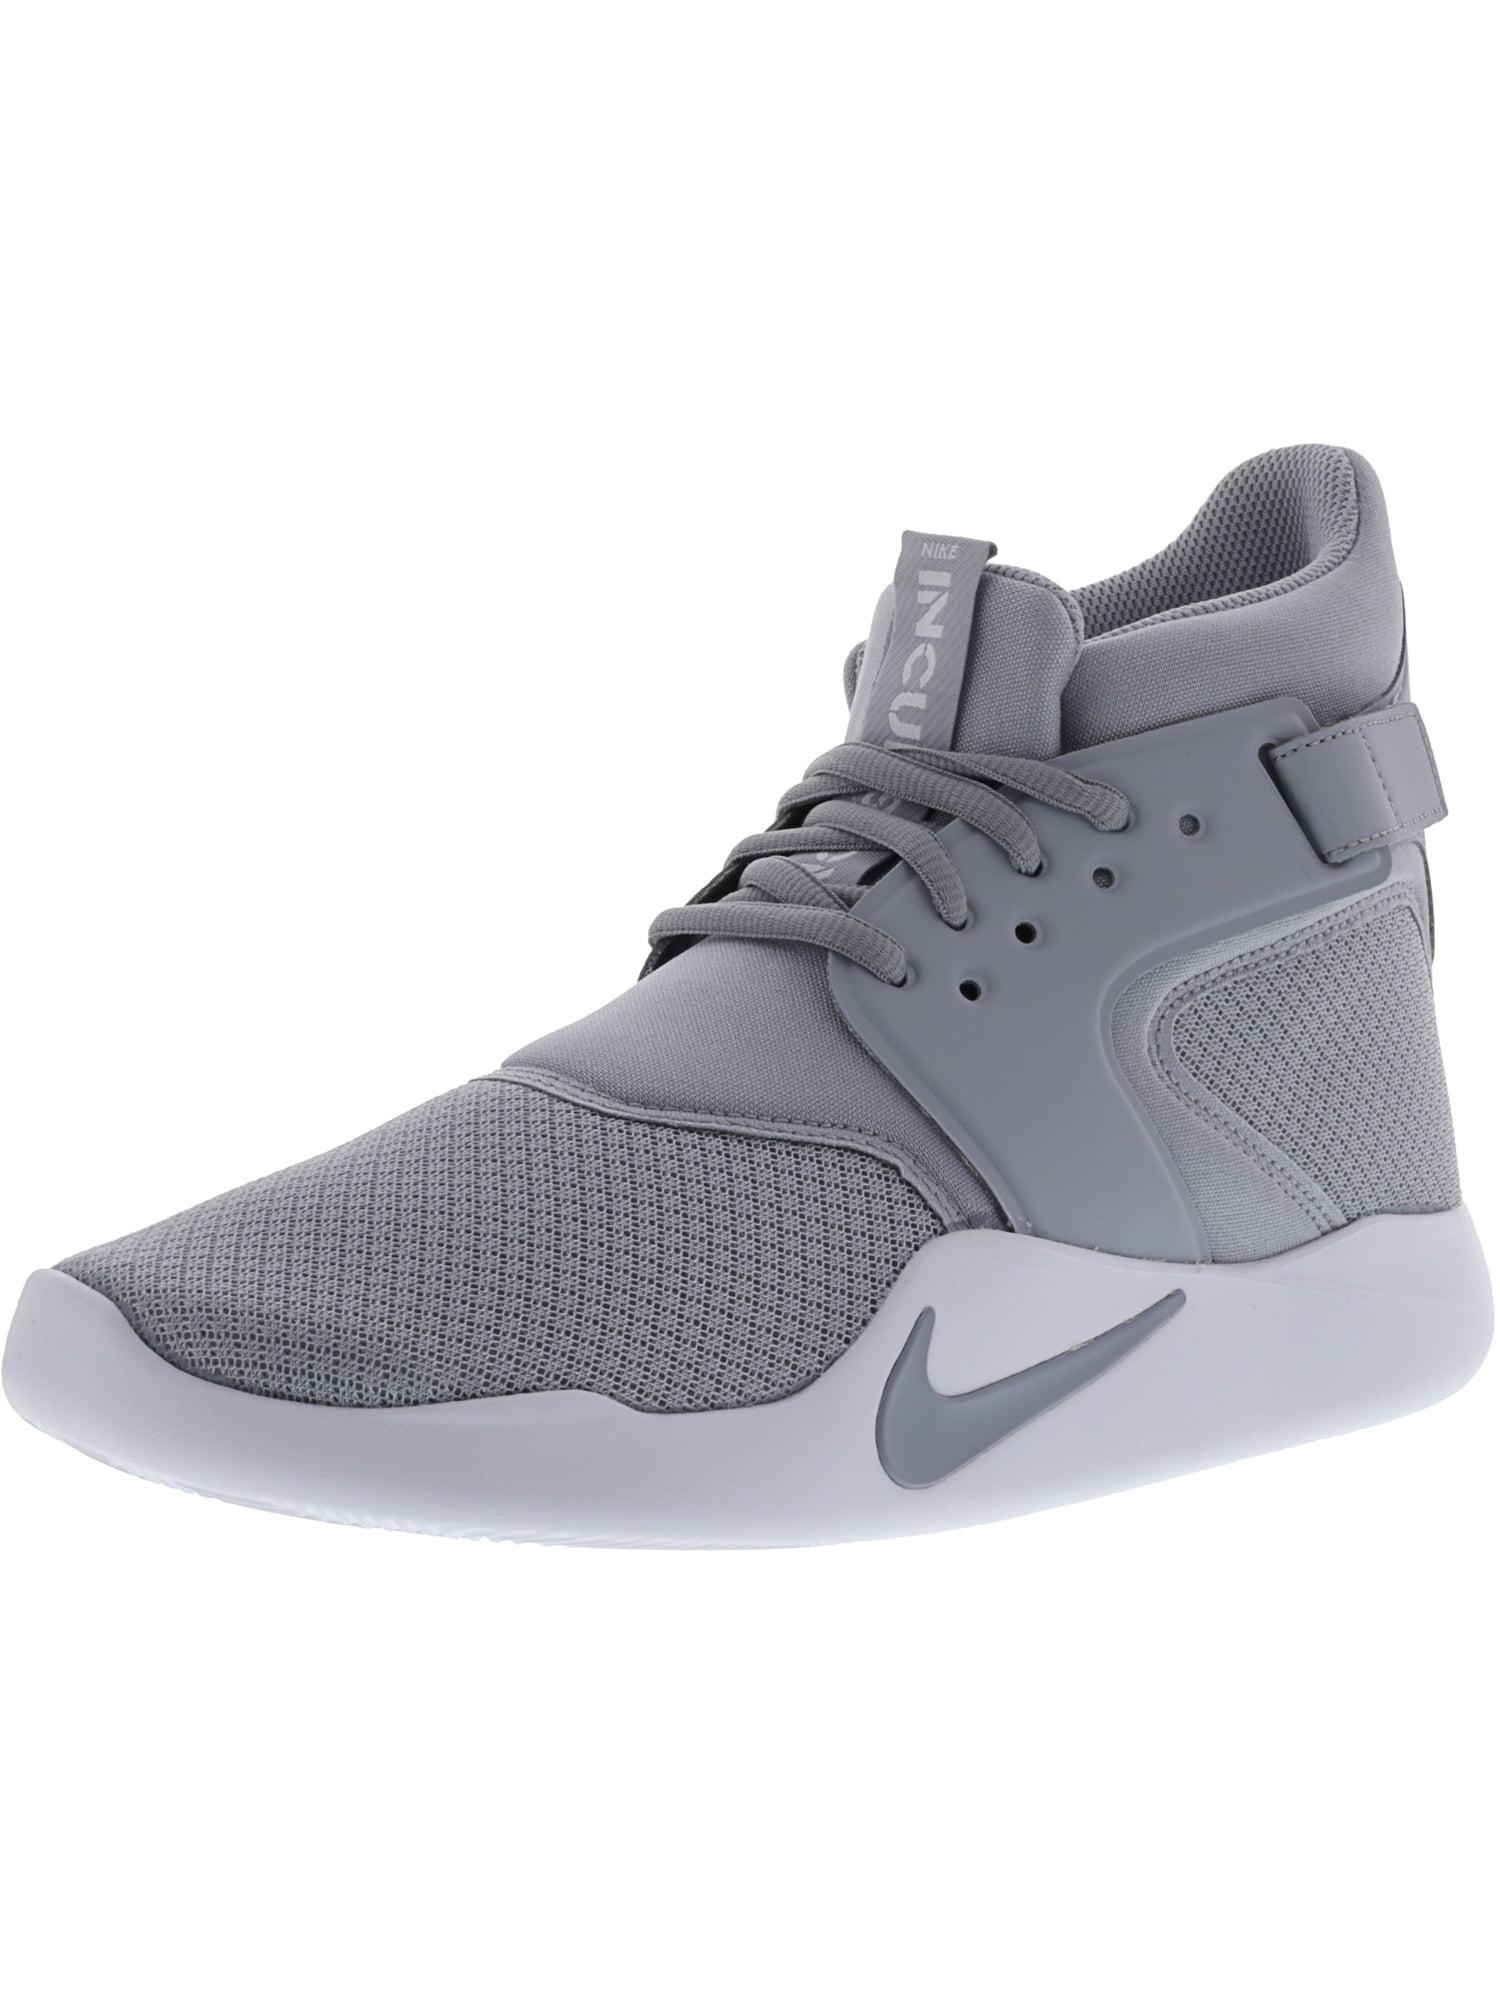 grey and white nike high tops